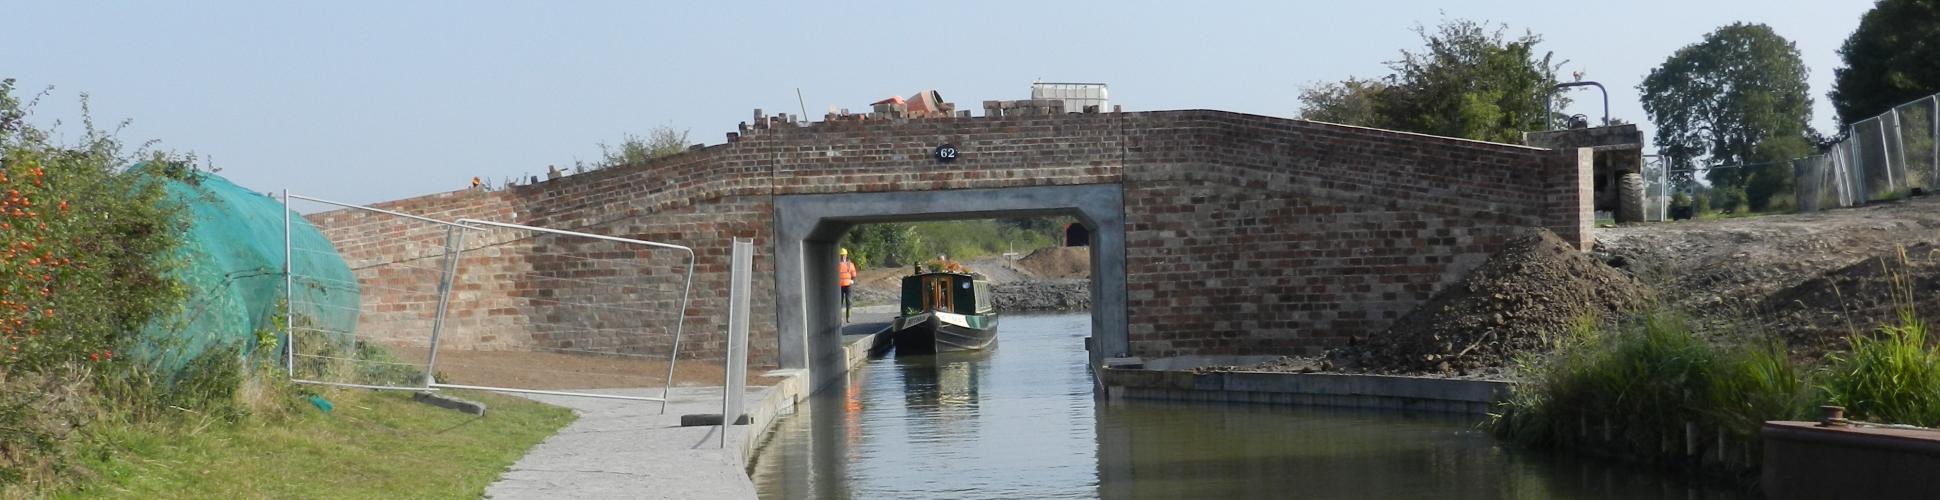 Bridge 62, Ashby Canal, Snarestone